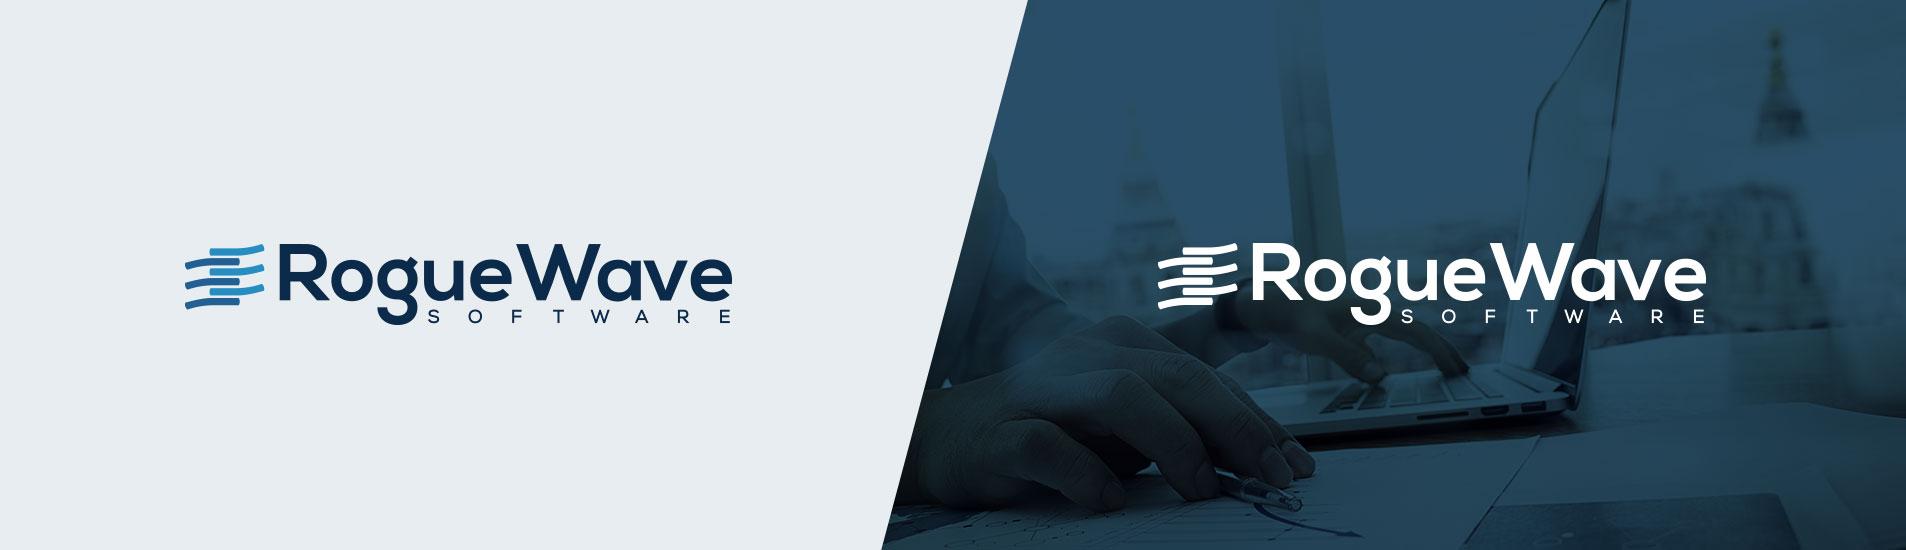 rogue wave logo design